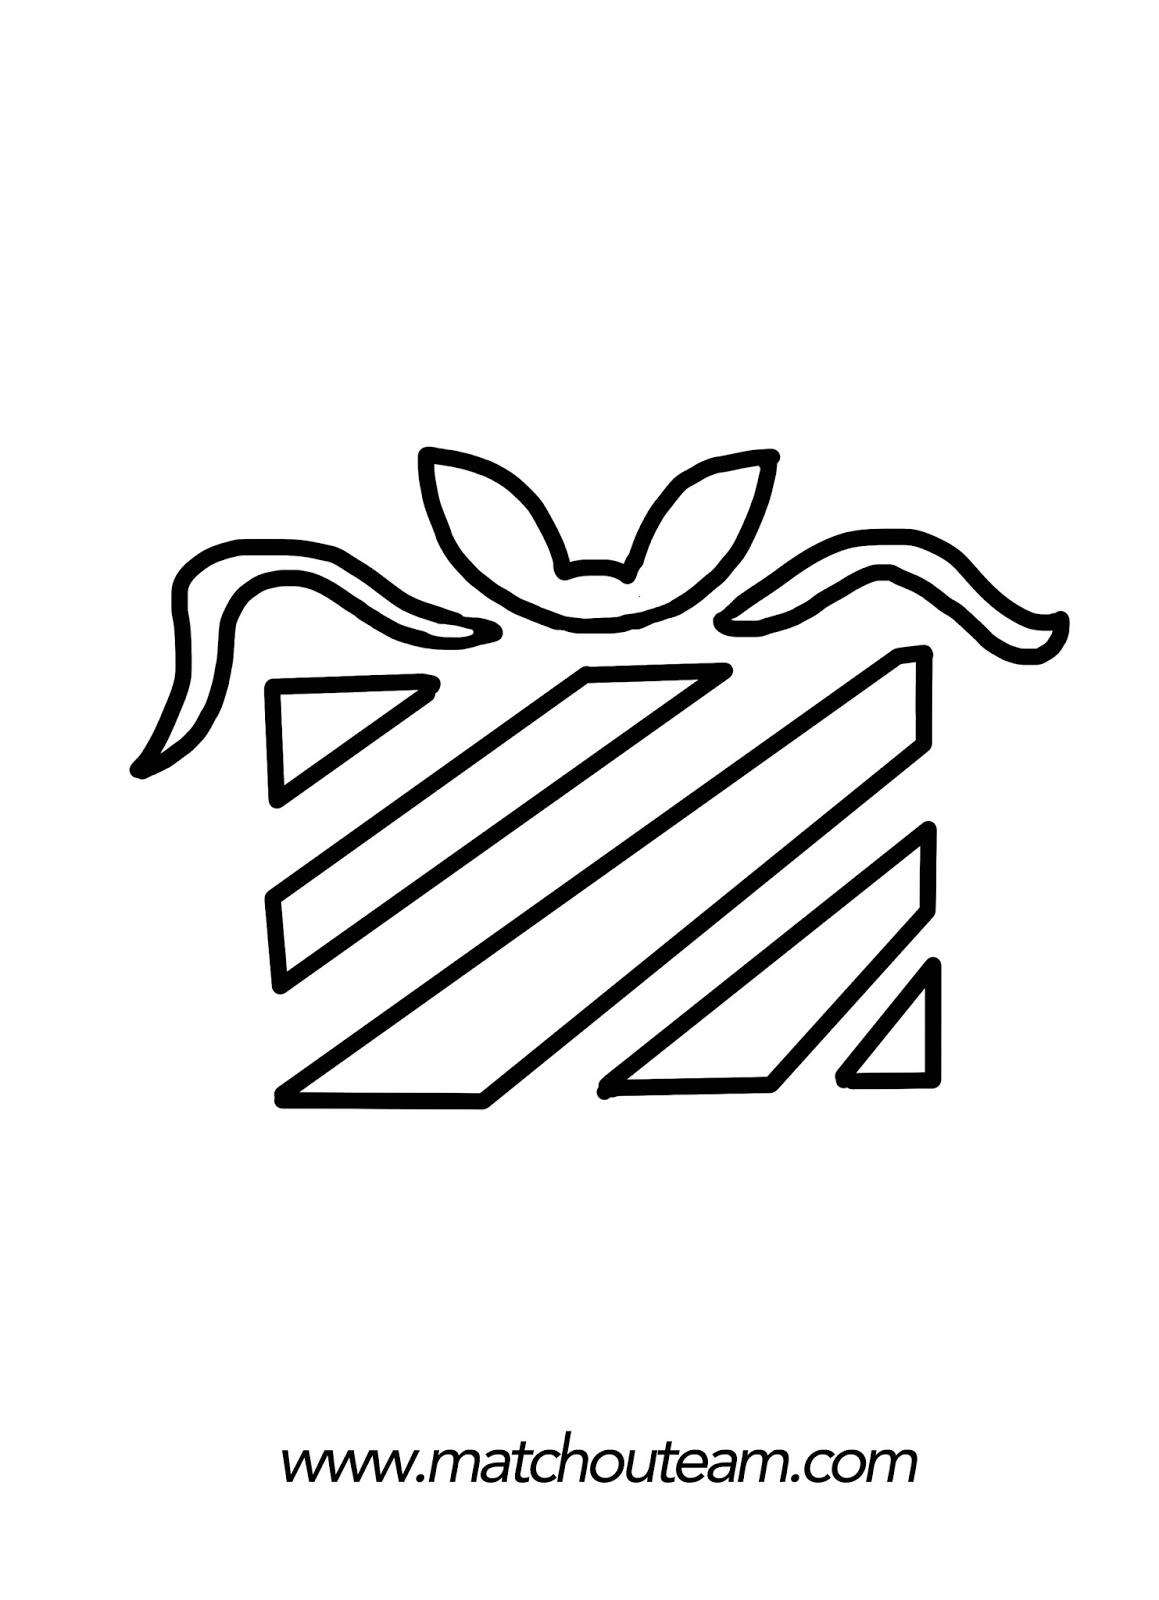 pochoir cadeau